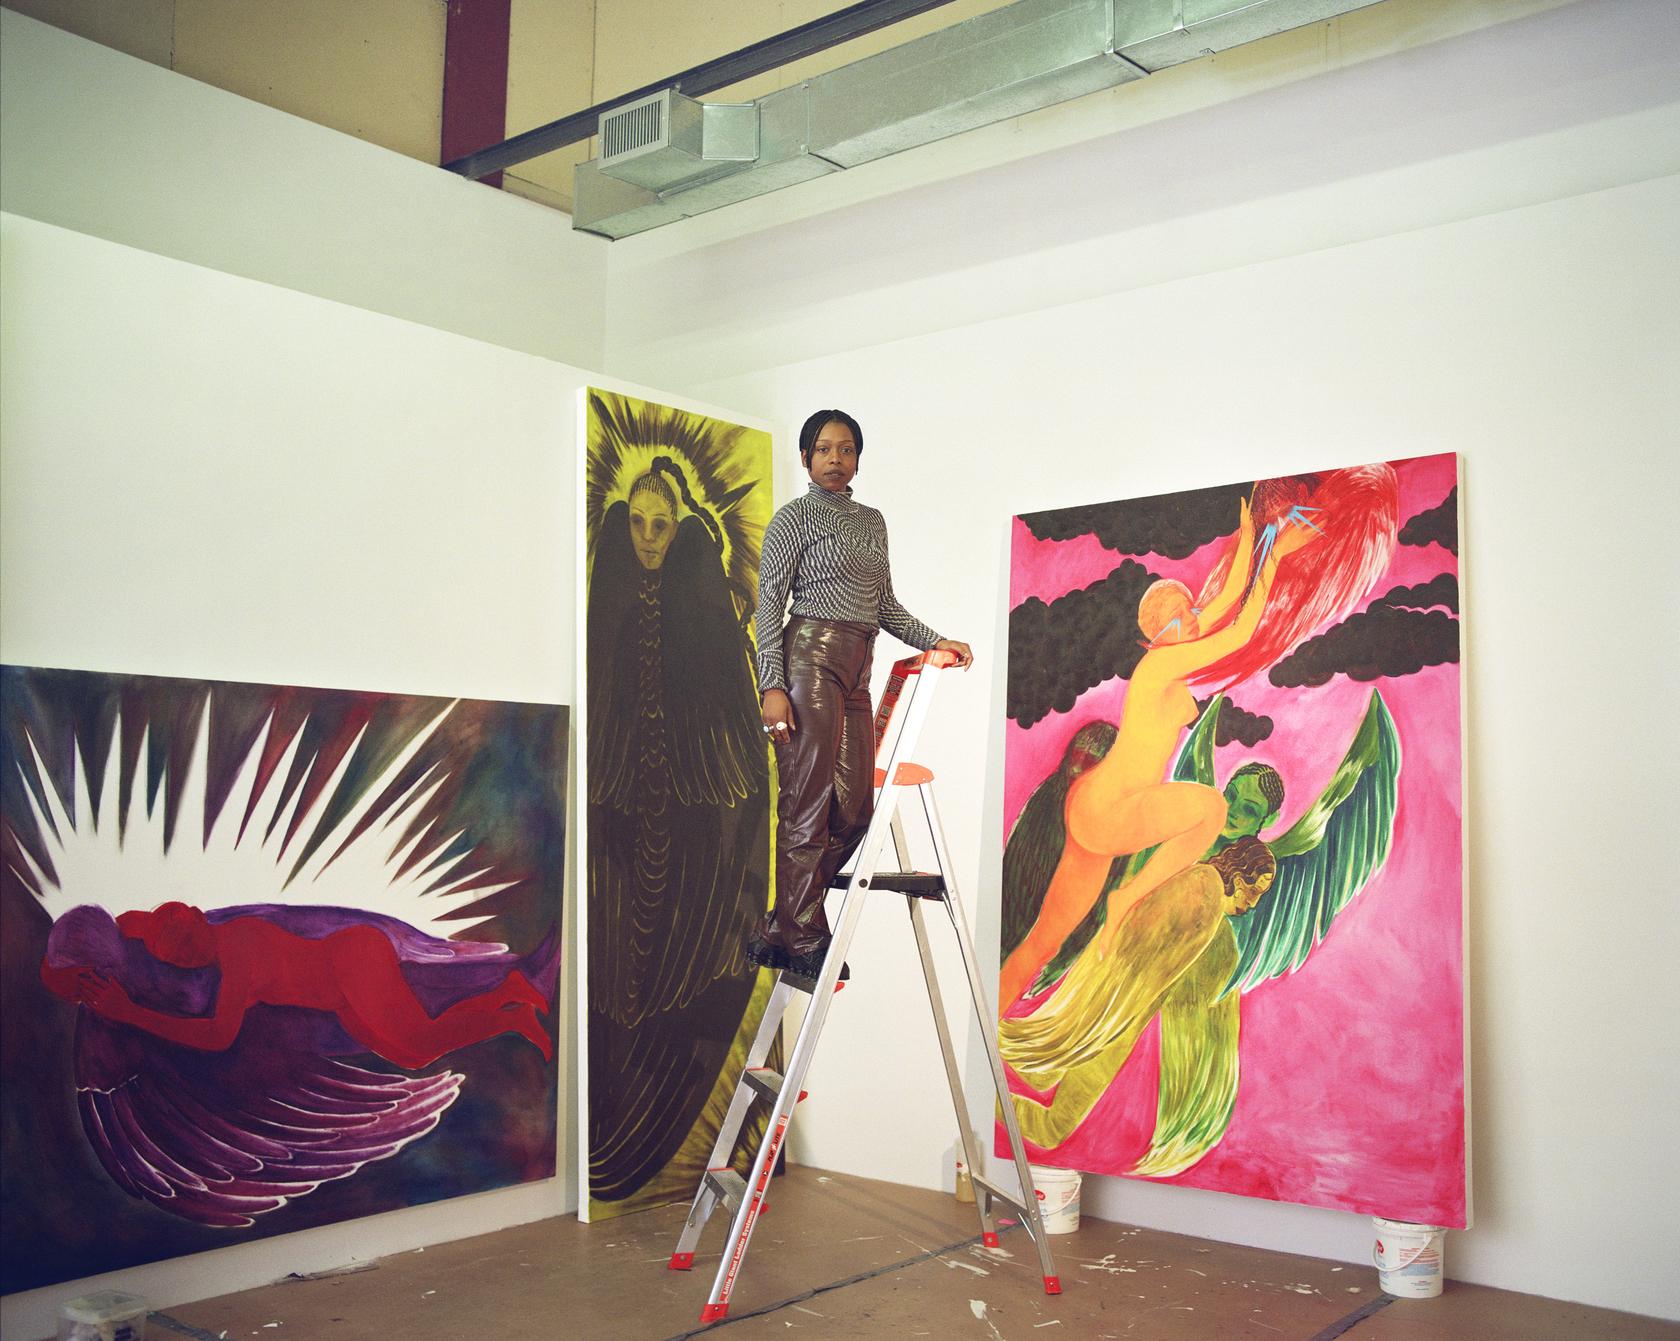 Naudline Pierre standing on a ladder in her studio